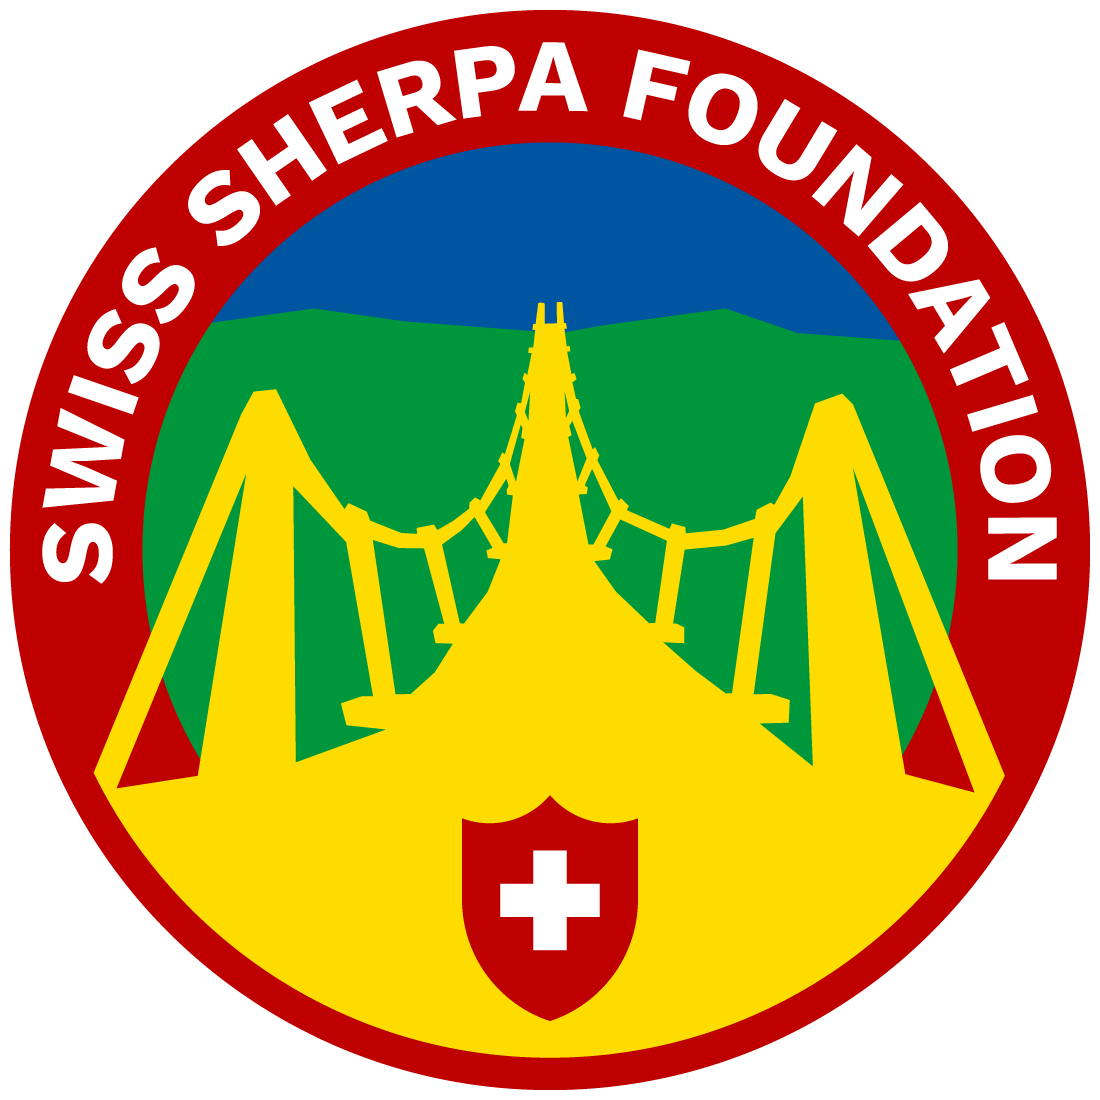 Swiss-Sherpa.org